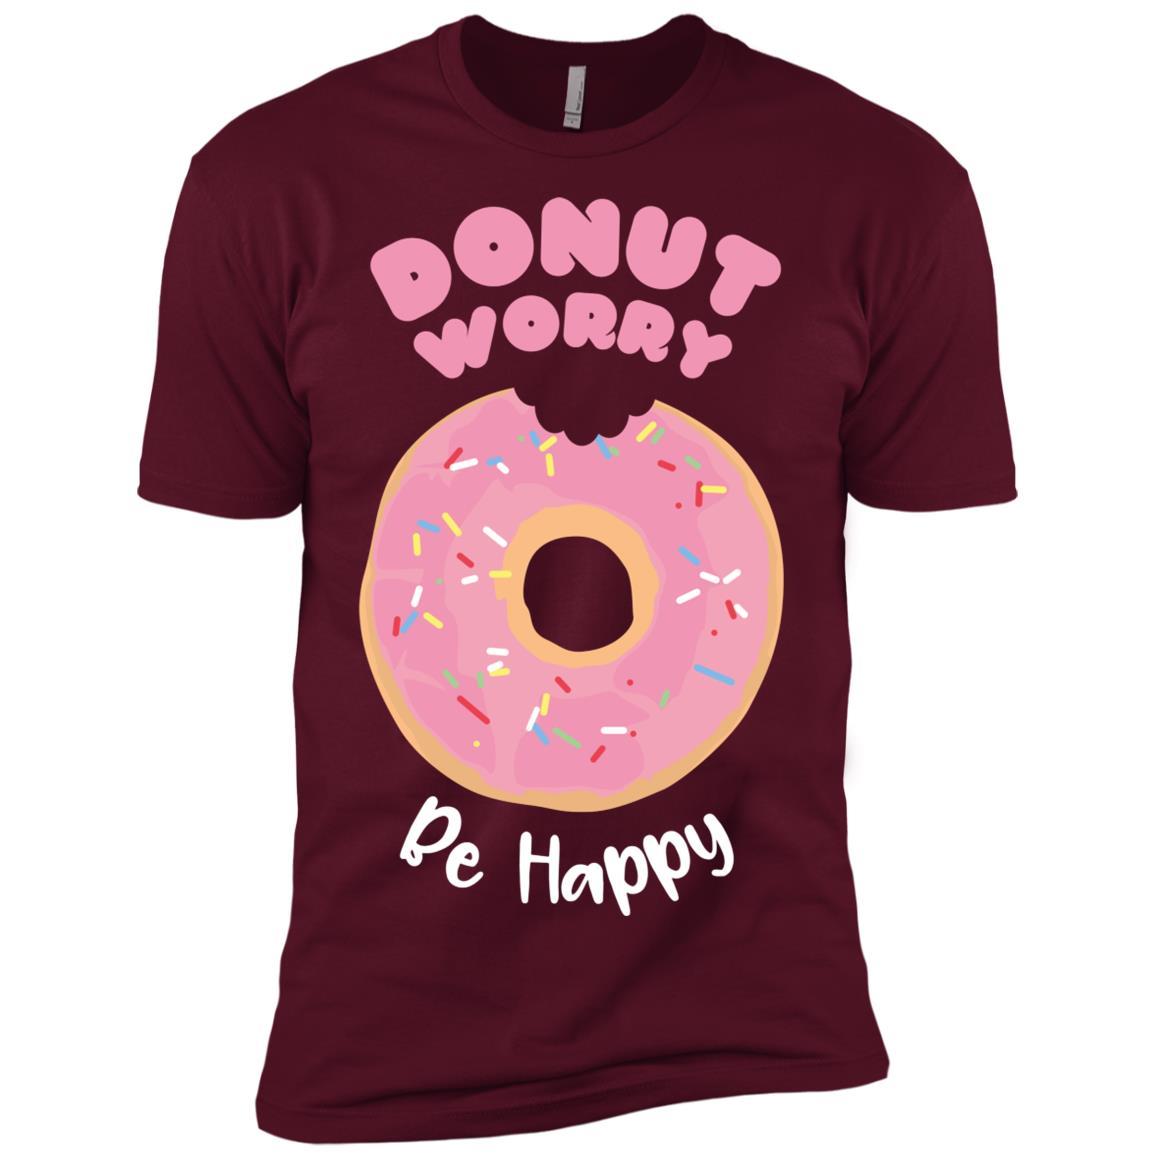 Donut worry, be happy funny joyful Men Short Sleeve T-Shirt